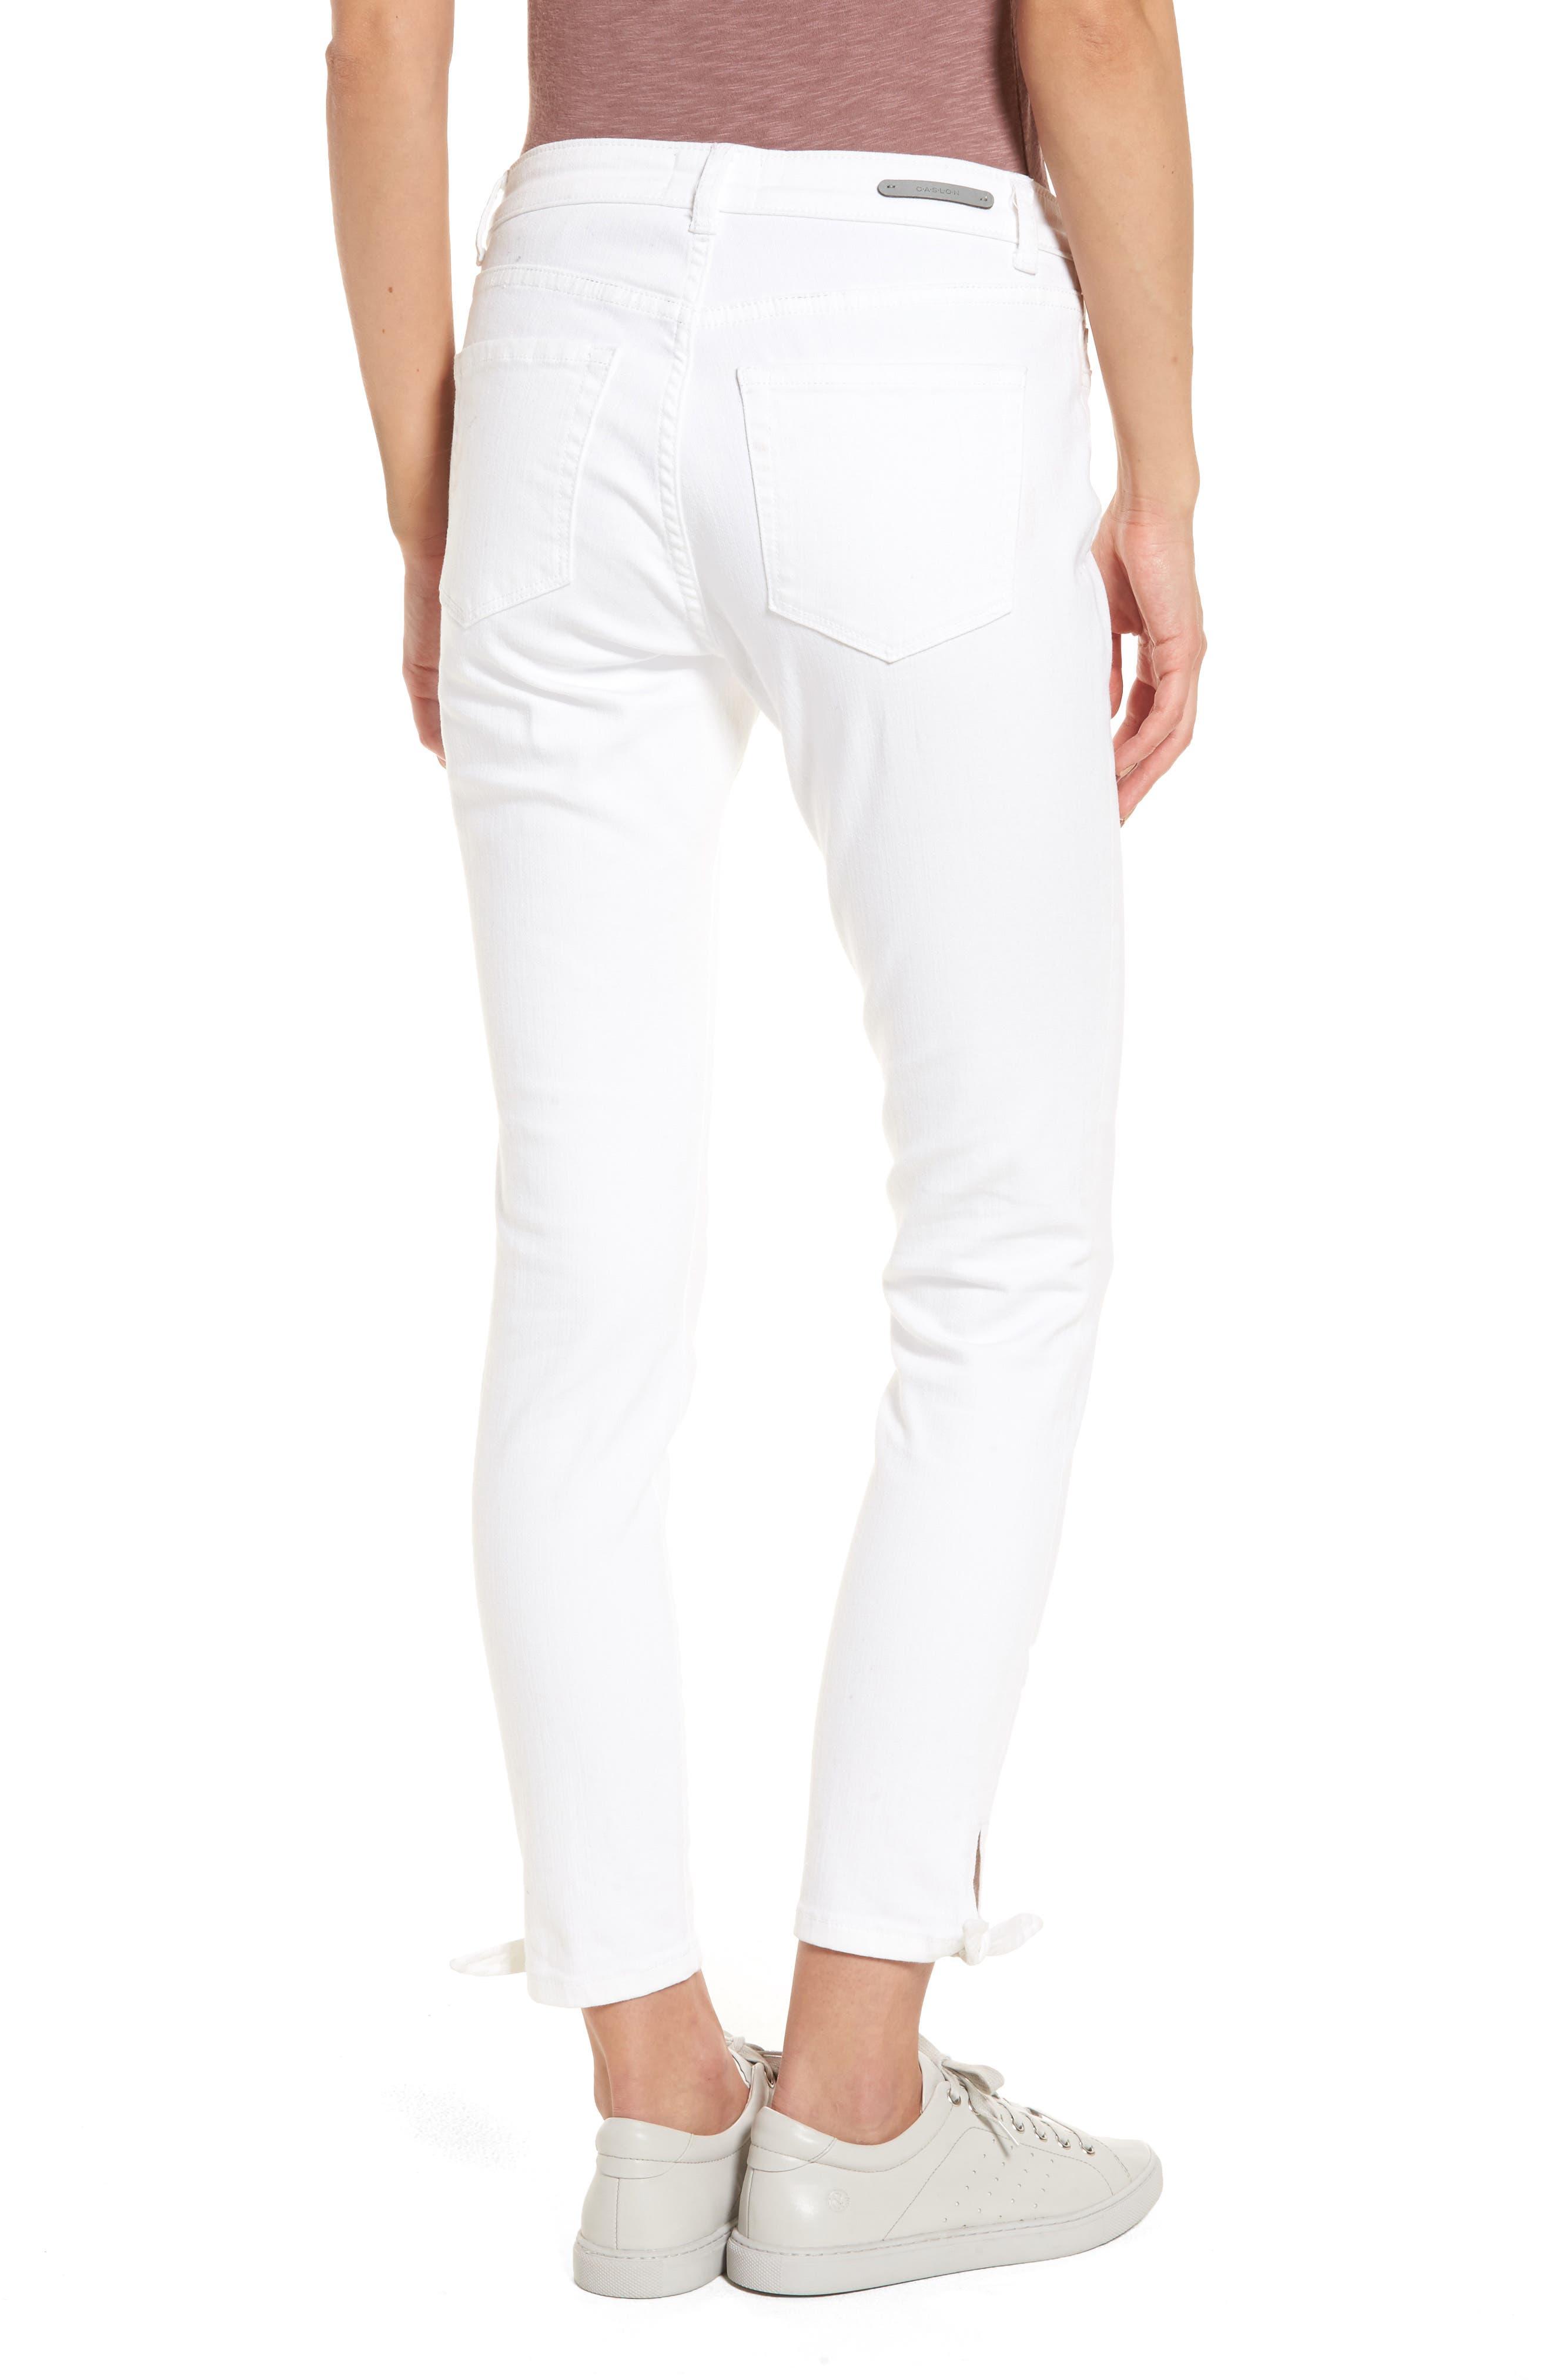 Alternate Image 3  - Caslon® Tie Ankle Skinny Jeans (Regular & Petite)